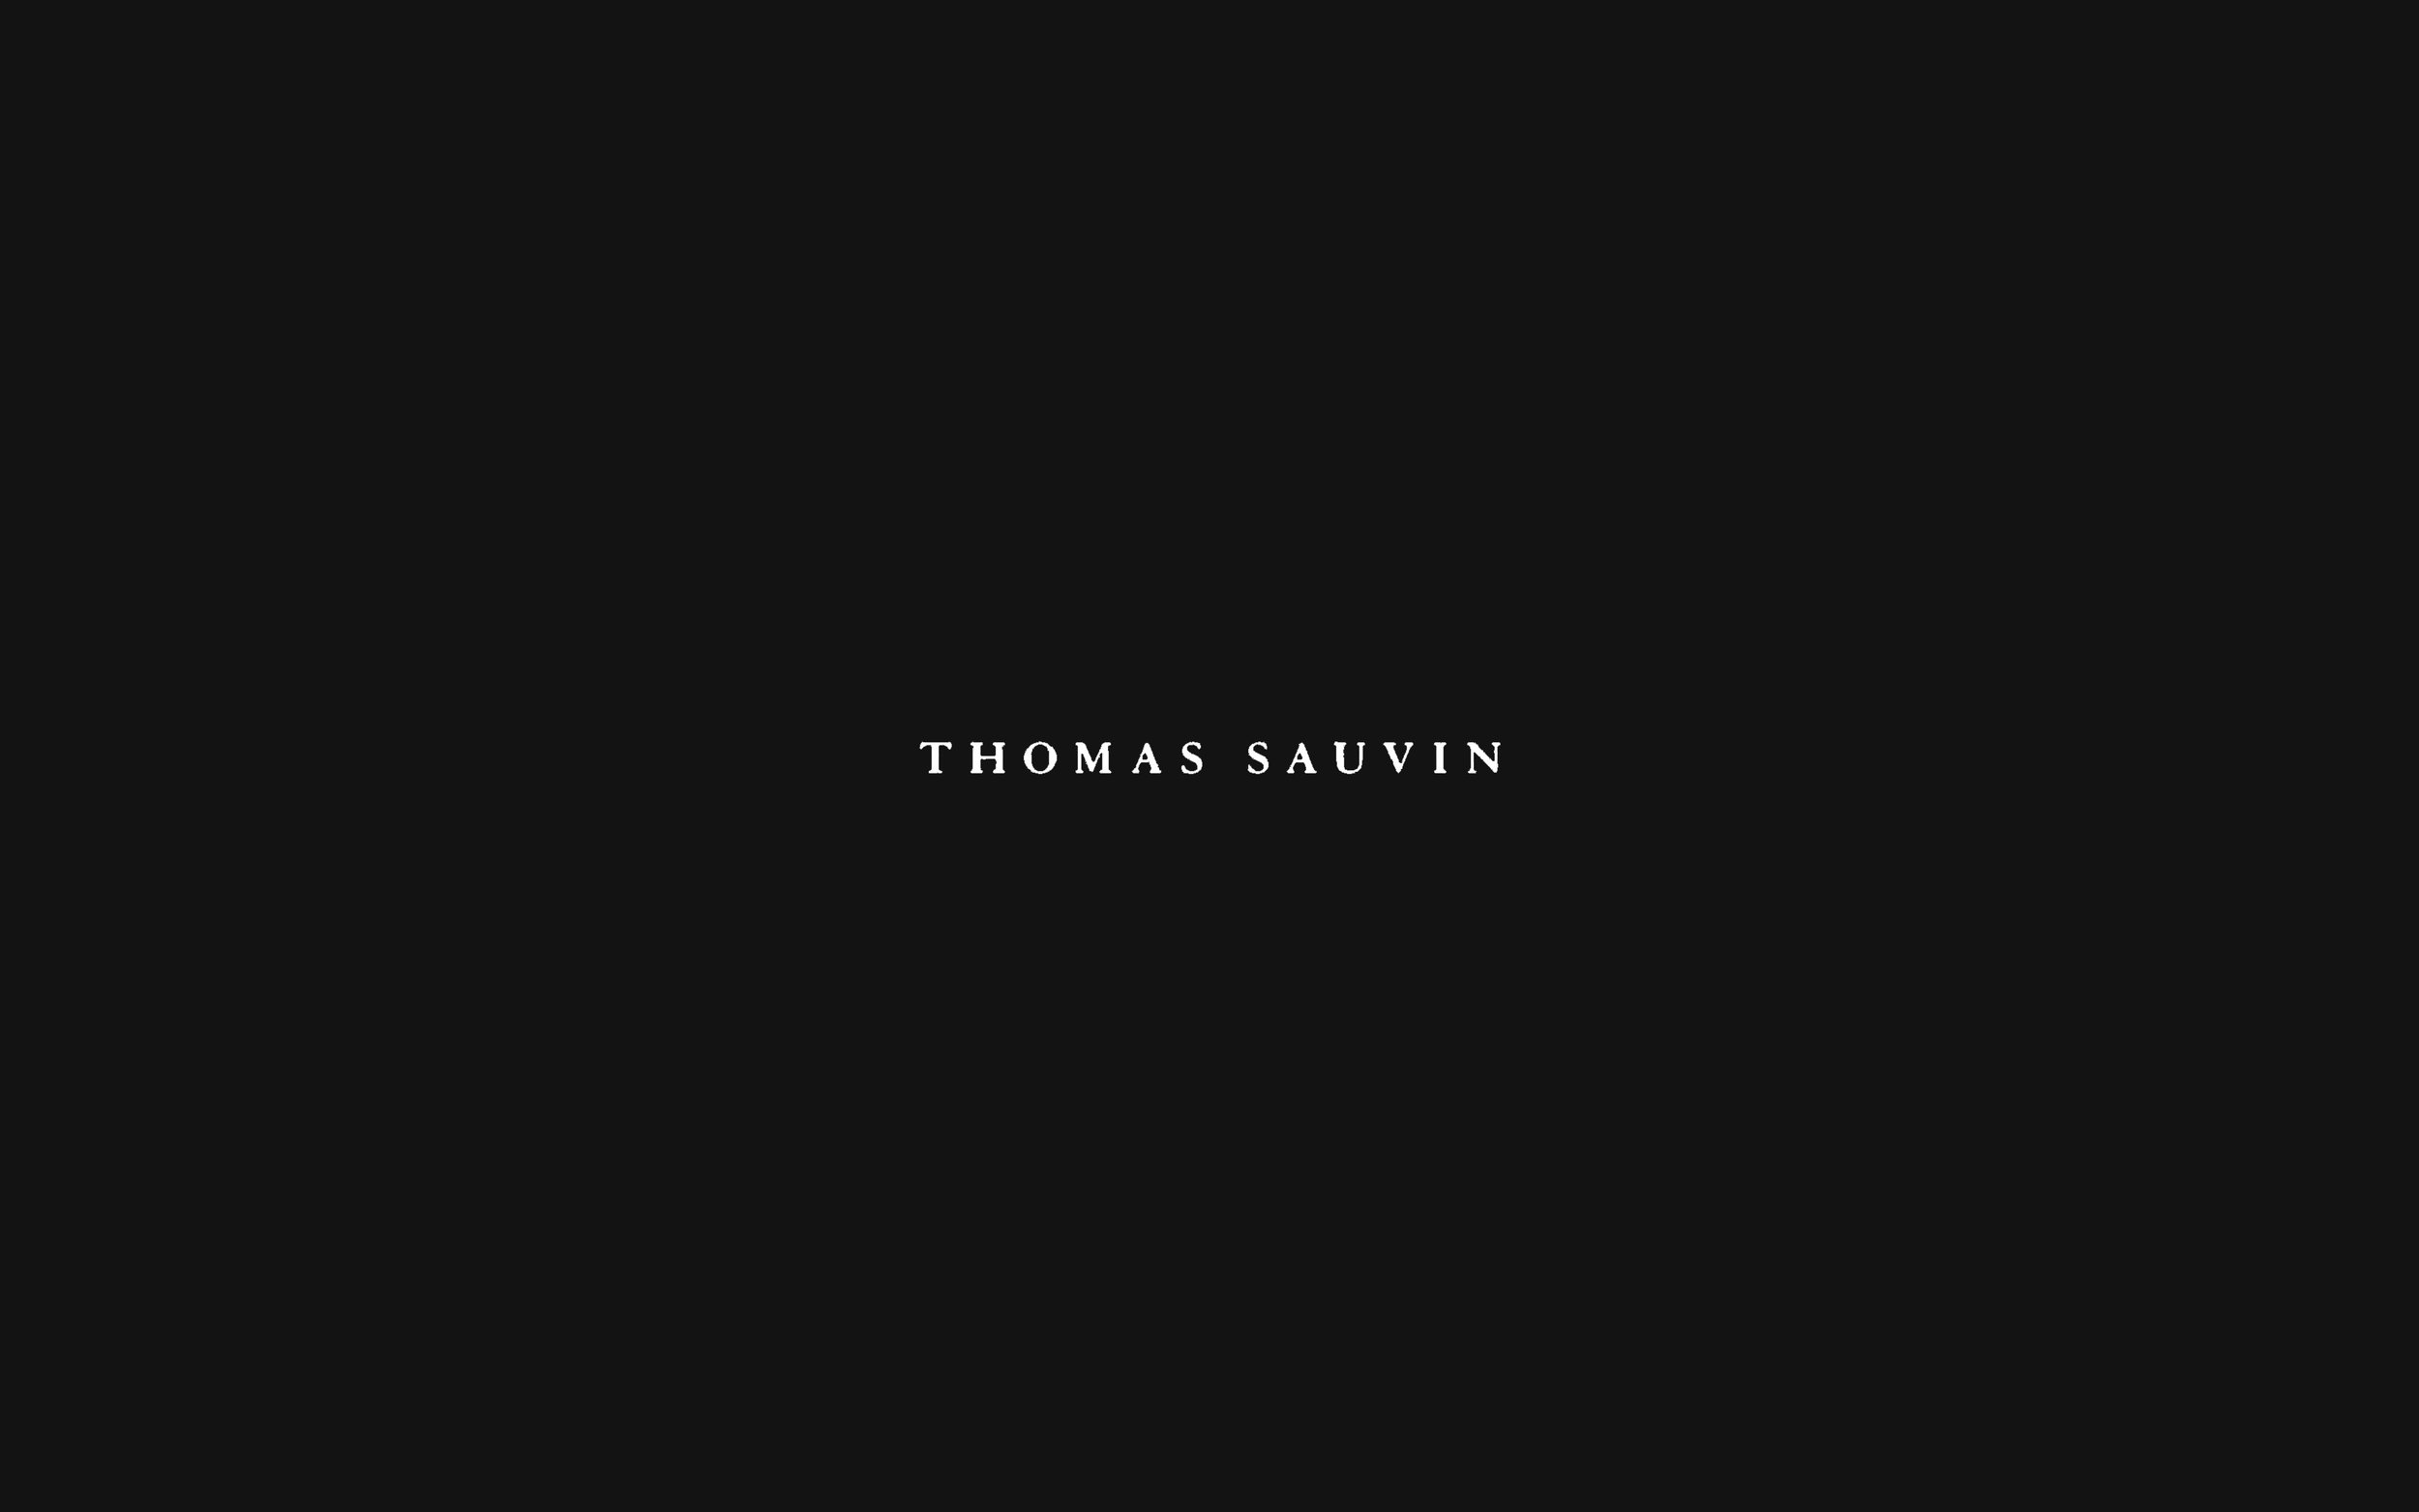 6A__Thomas_Sauvin_00.jpg